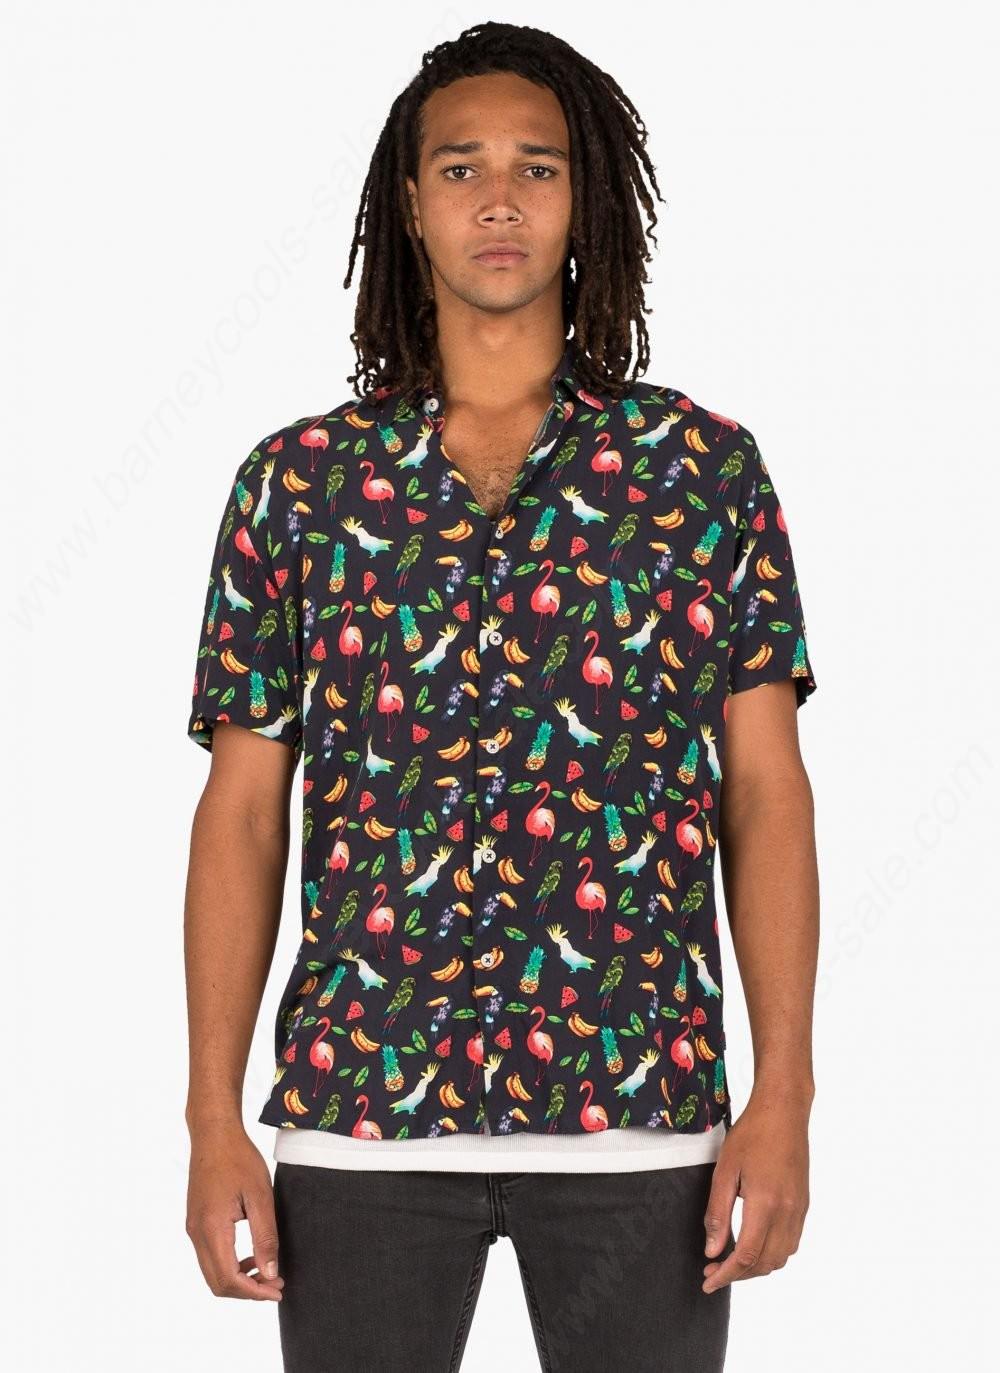 Barney Cools Man Holiday Shirts Aussie Summer - -0